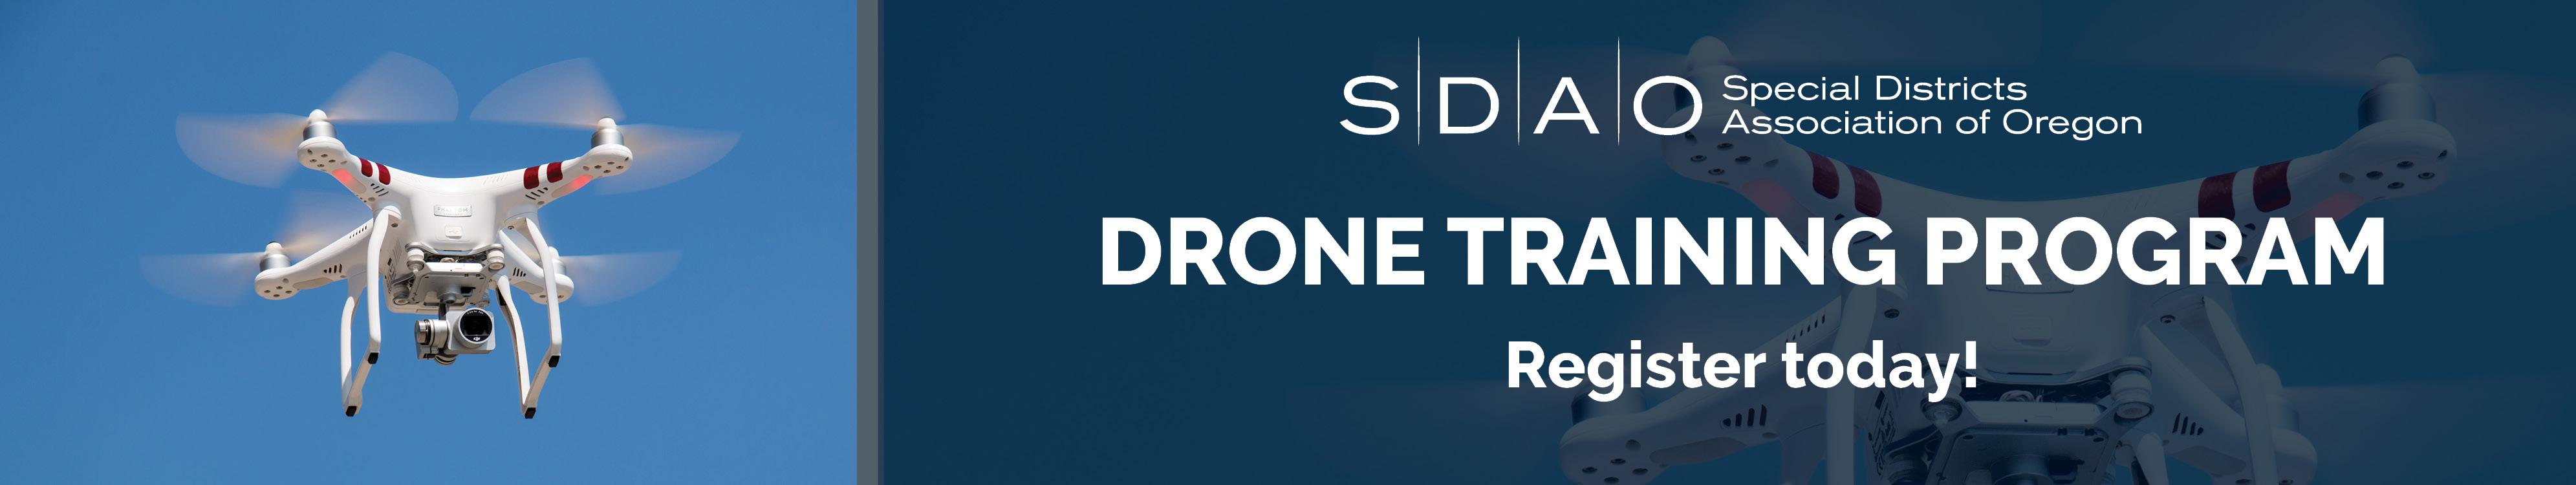 SDIS Drone Training Program - Summer 2018